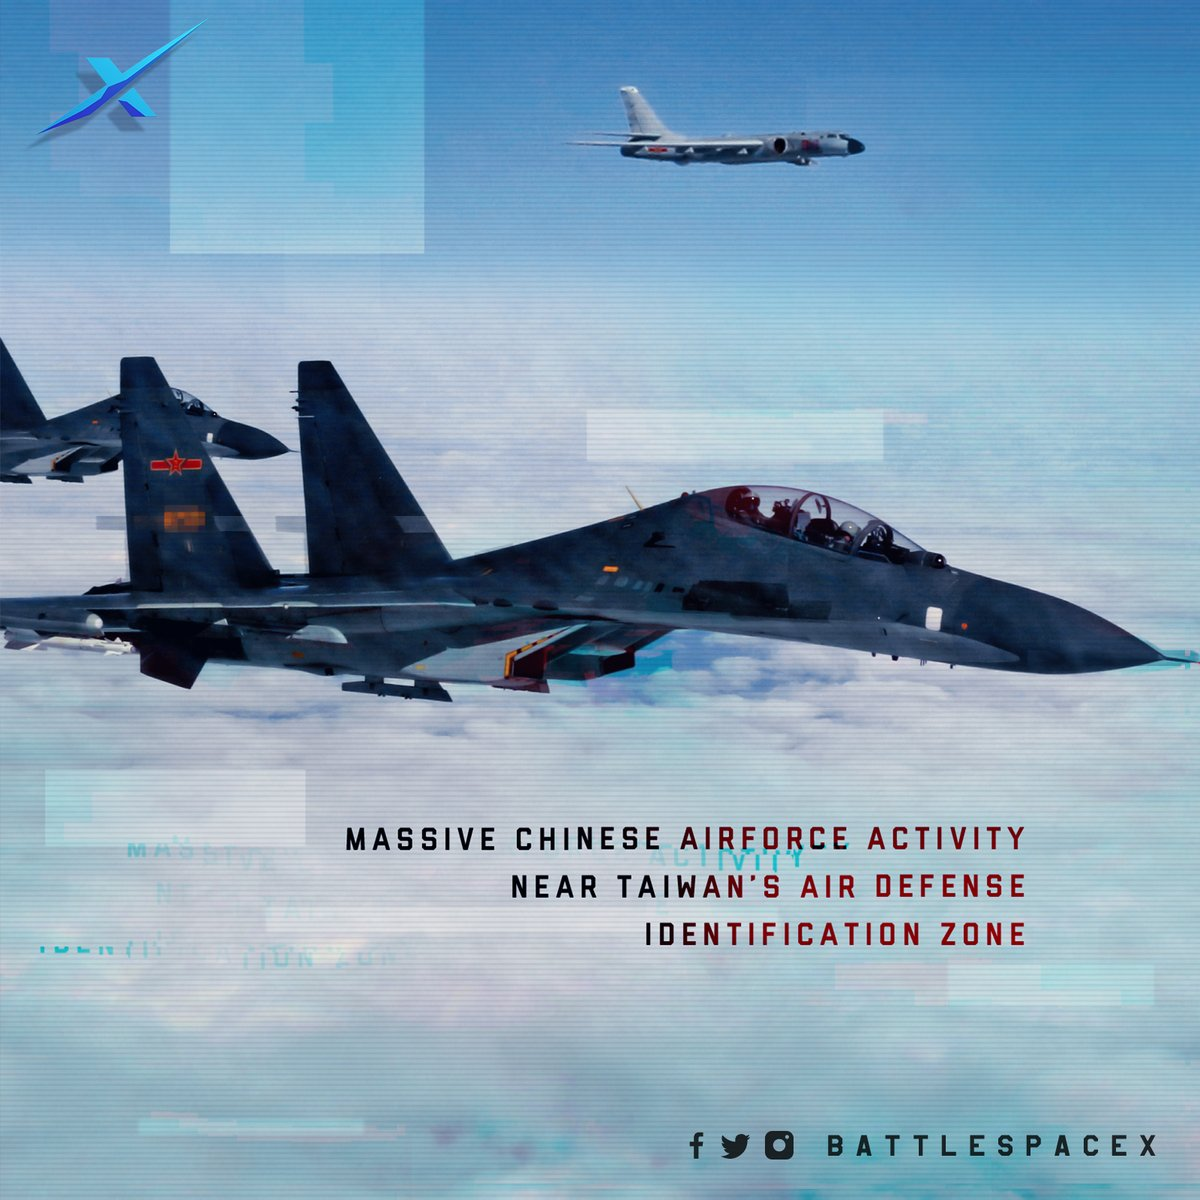 Massive #Chinese #Airforce activity near Taiwan's Air Defense Identification Zone  #Taiwan #China #Airforce #UnitedStates #BattlespaceX #ChineseGovt #PLA #PLAAF #ChineseAirforce #TaiwanAirforce #Asiapacific #SouthChinaSea #ChineseNavy #USNavy #China #India #SouthAsia #Military